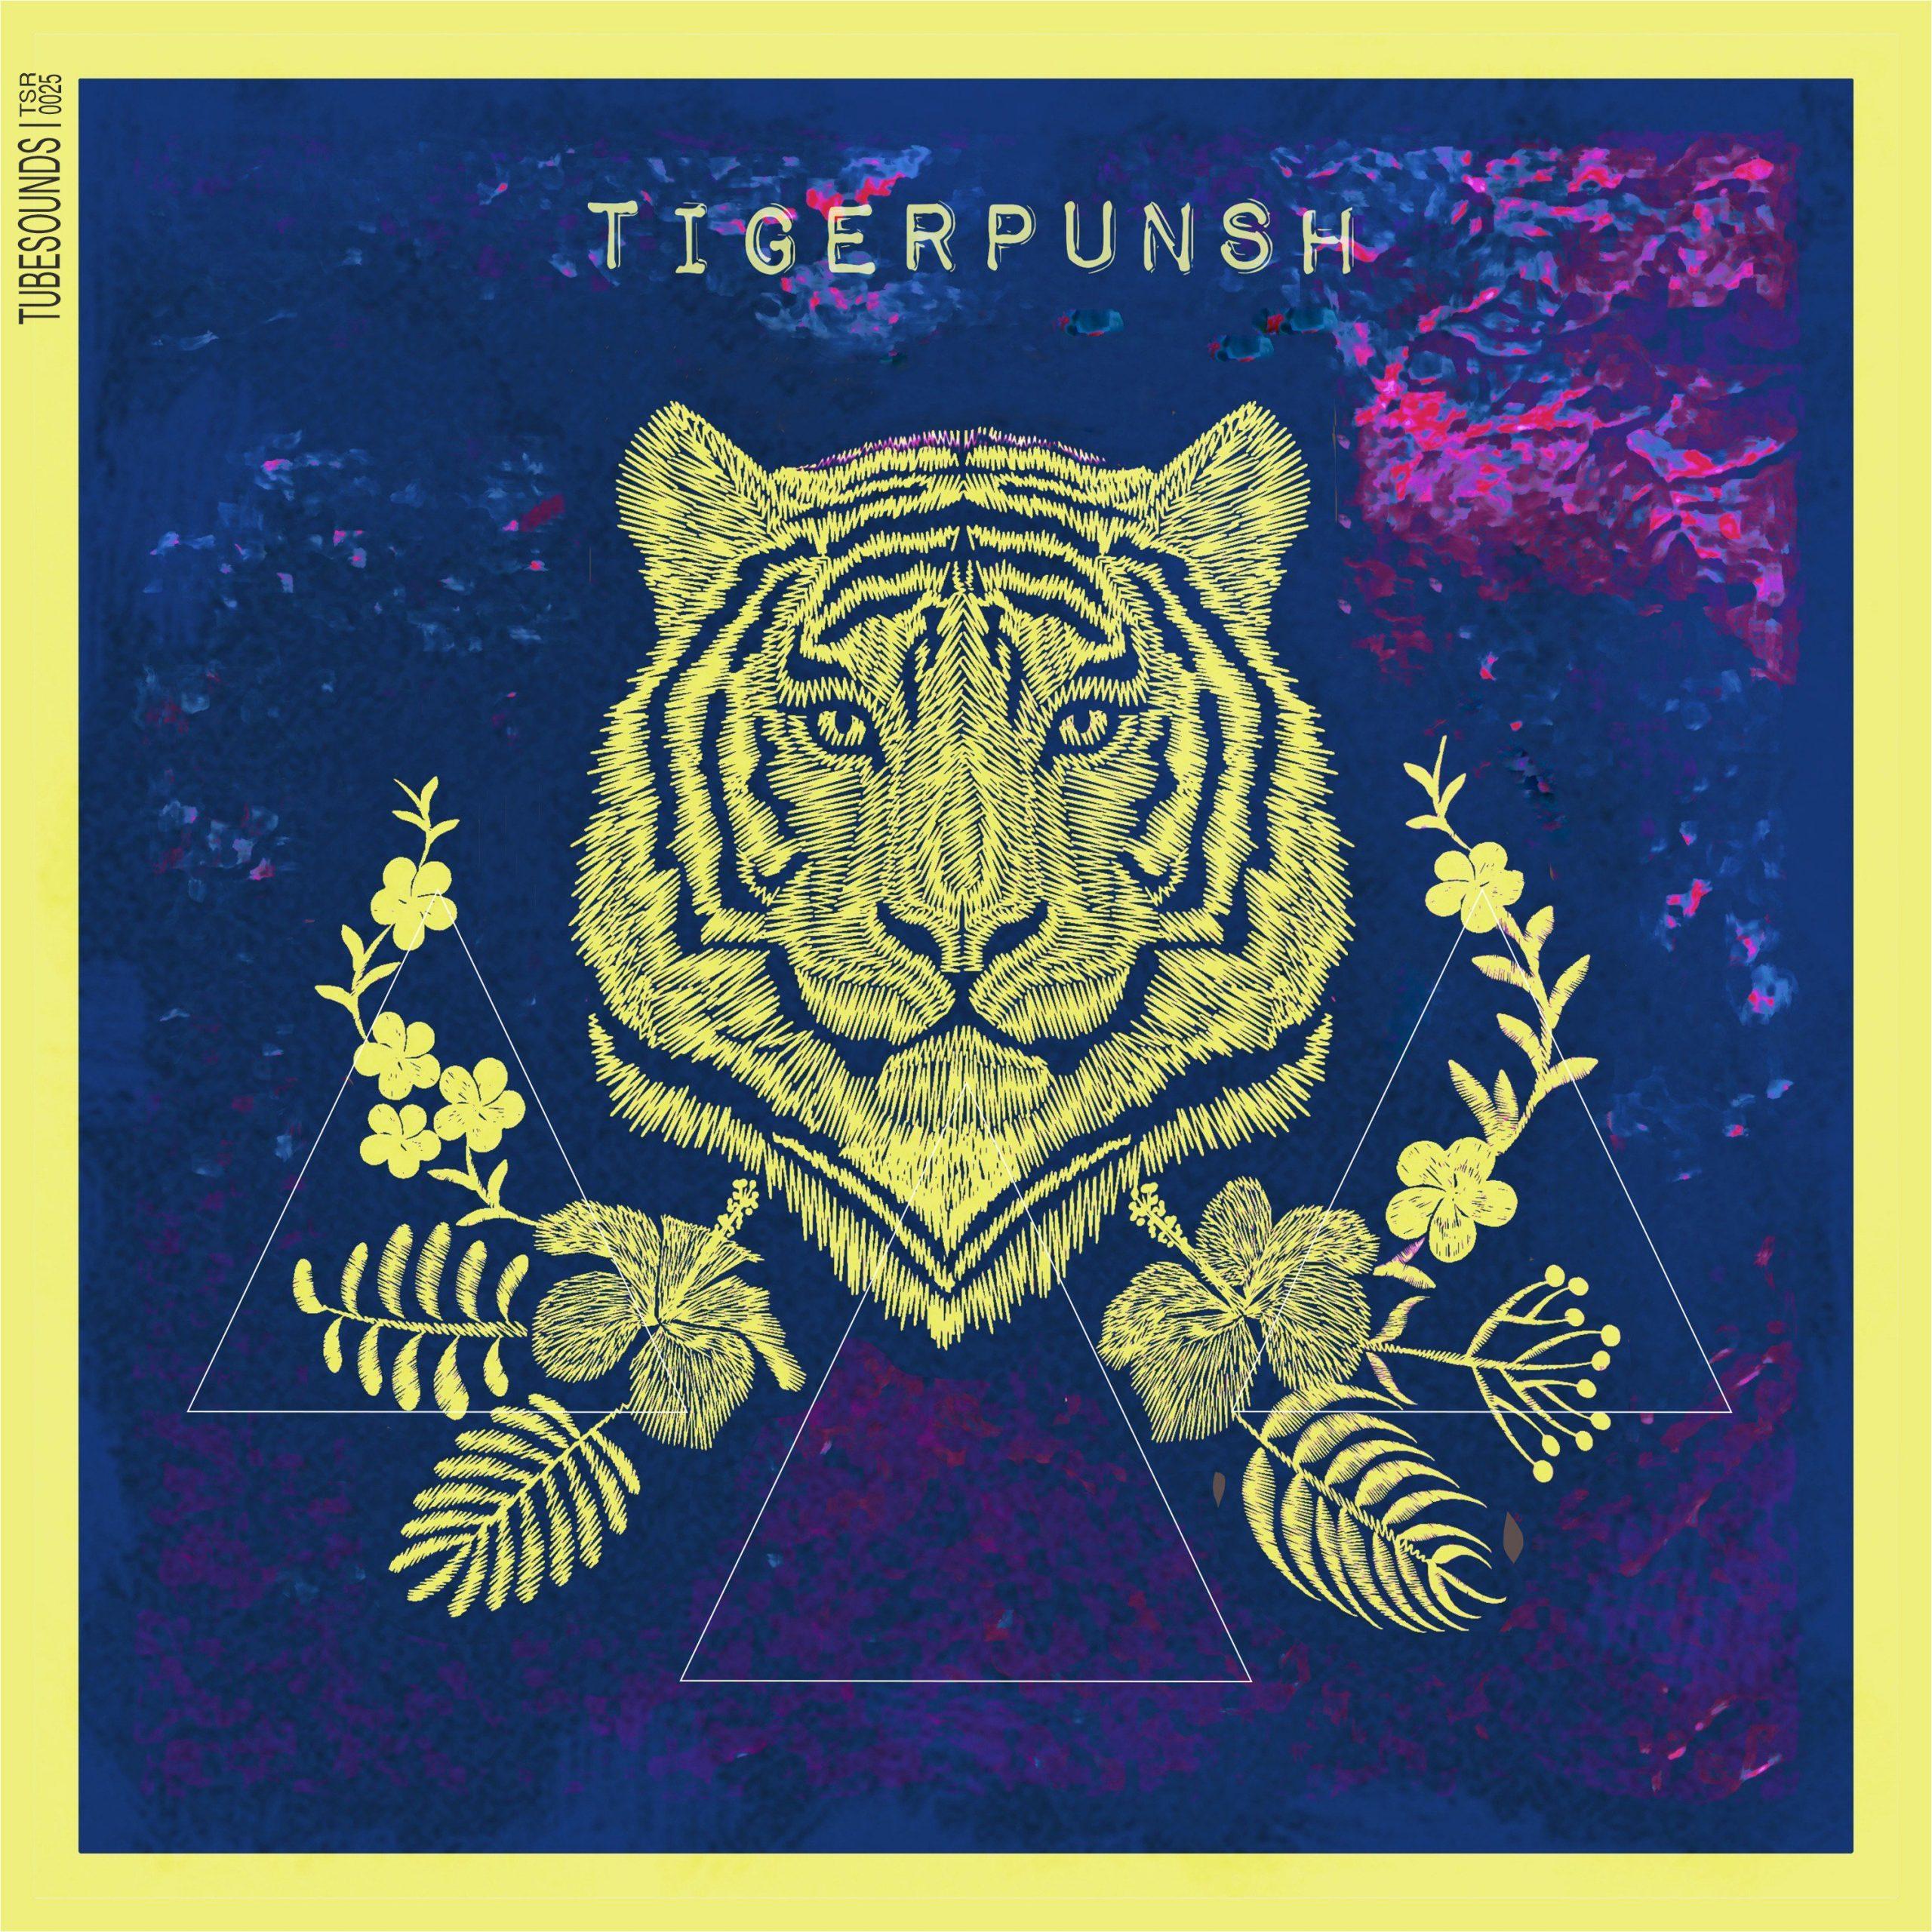 Tigerpunsh - EP cover